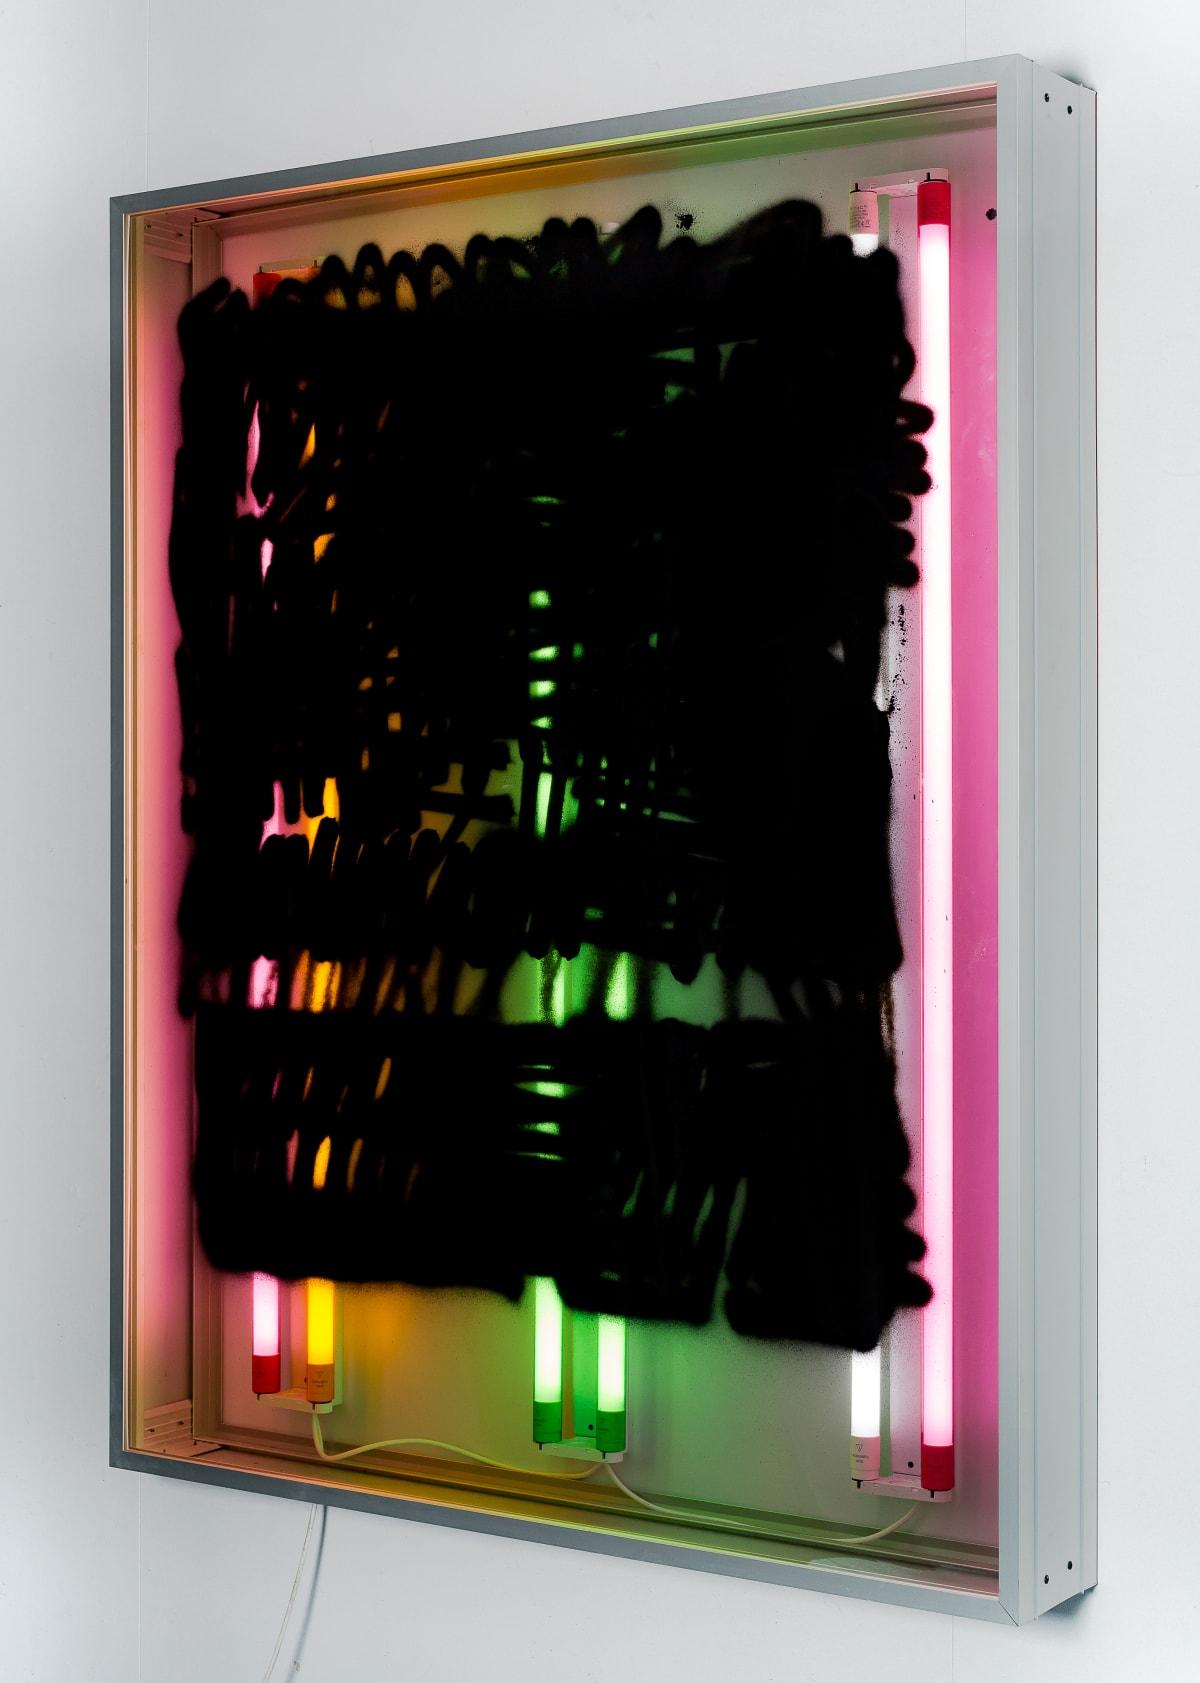 Thomas van Linge, (c) Untitled (Mirror Box), 2019